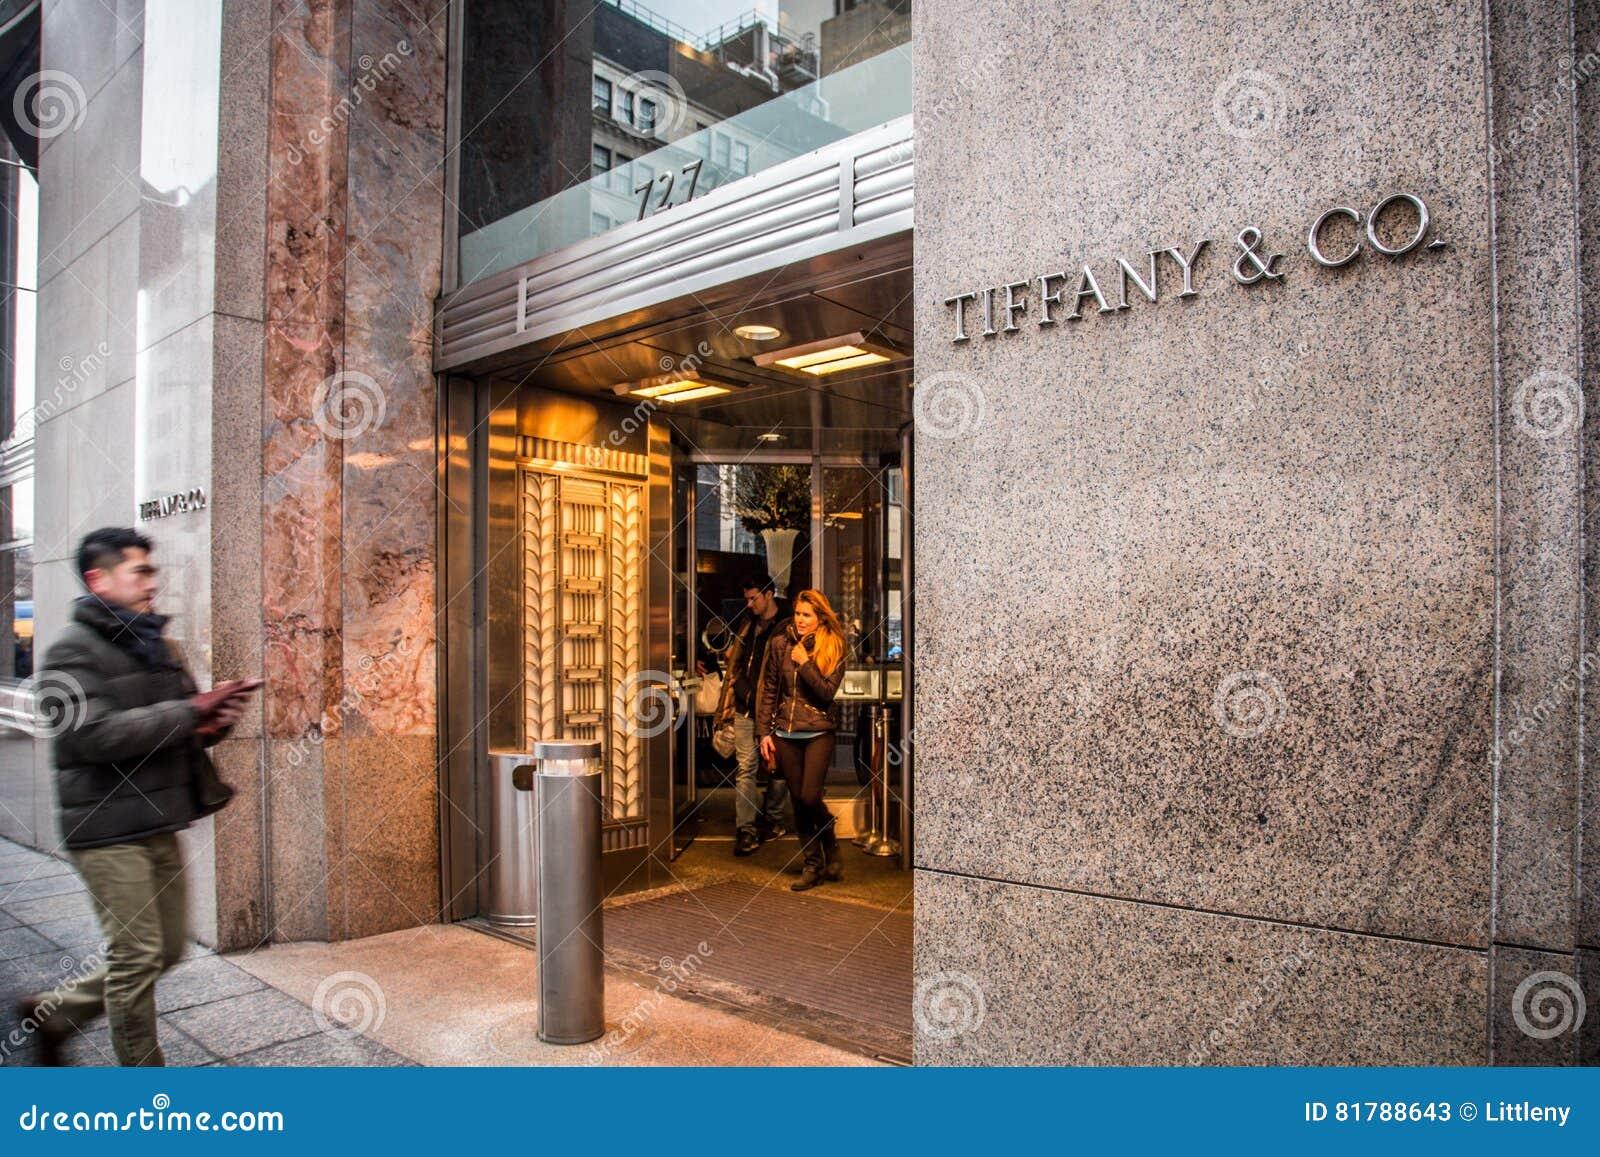 b88f6a4abd13c Tiffany & Co. NYC editorial stock photo. Image of luxury - 81788643